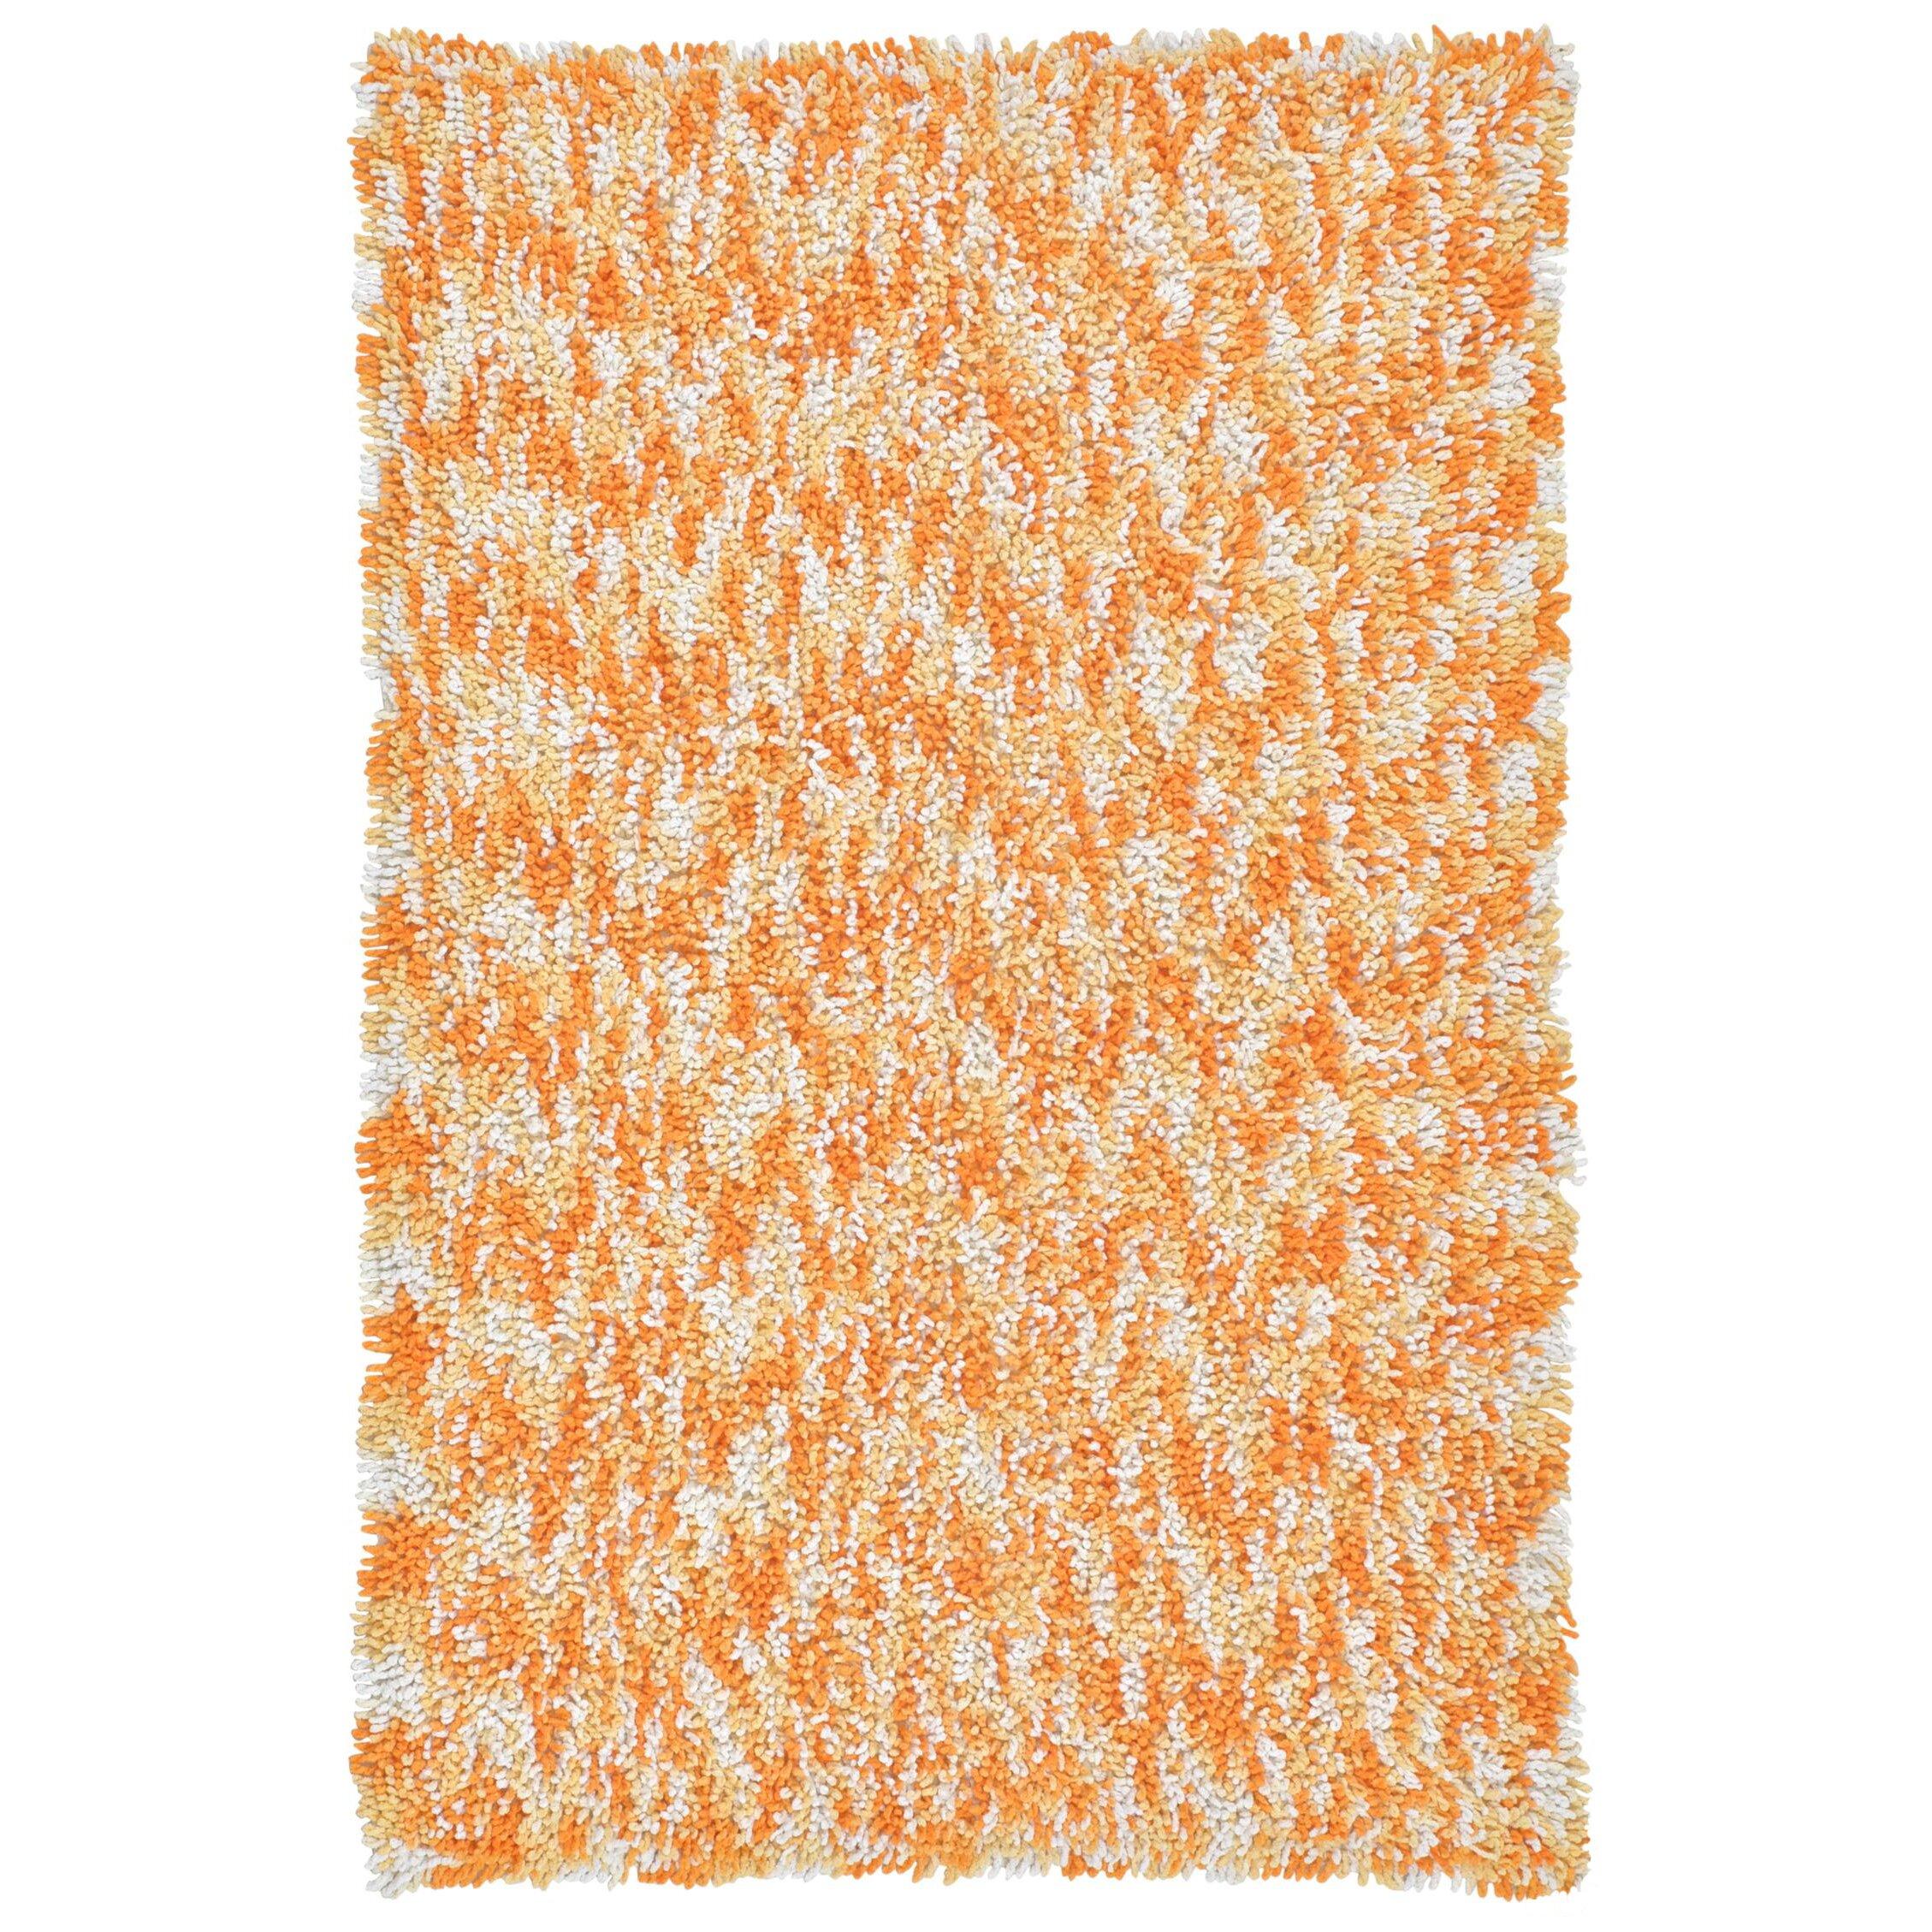 St. Croix Shagadelic Orange Twist Swirl Shag Area Rug